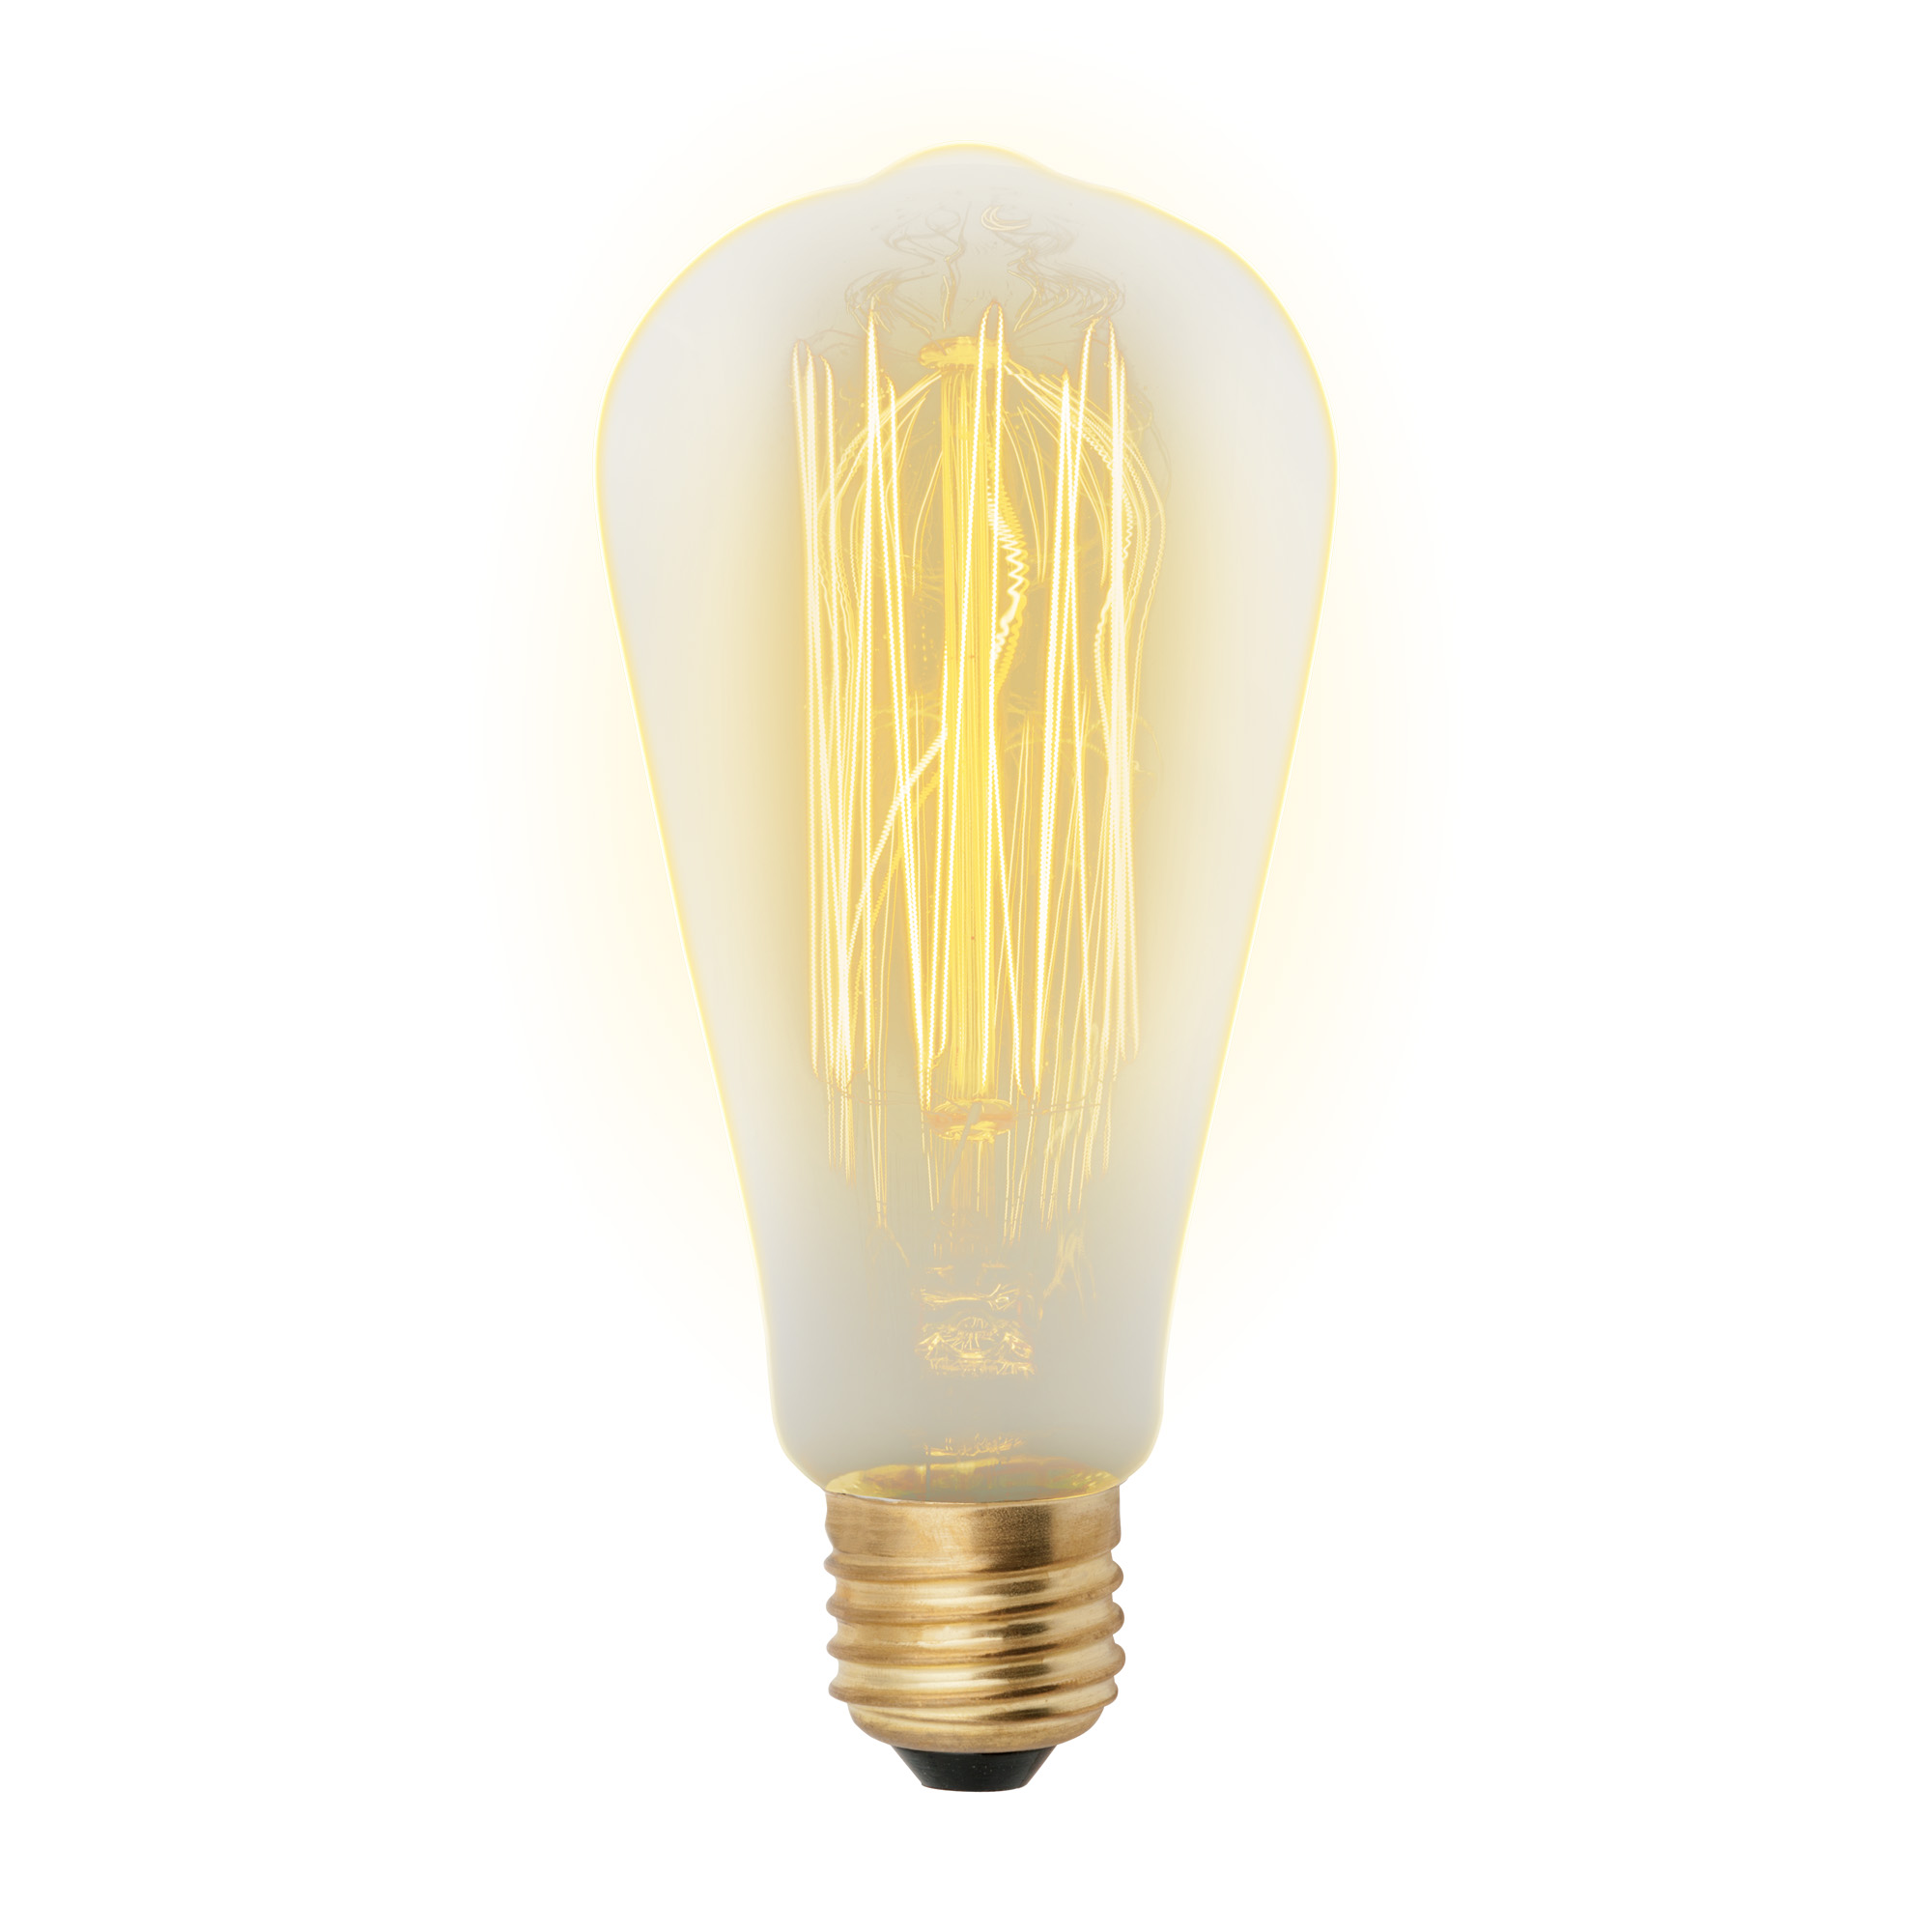 Лампа накаливания Uniel Vintage il-v-st64-60/golden/e27 vw02 10шт